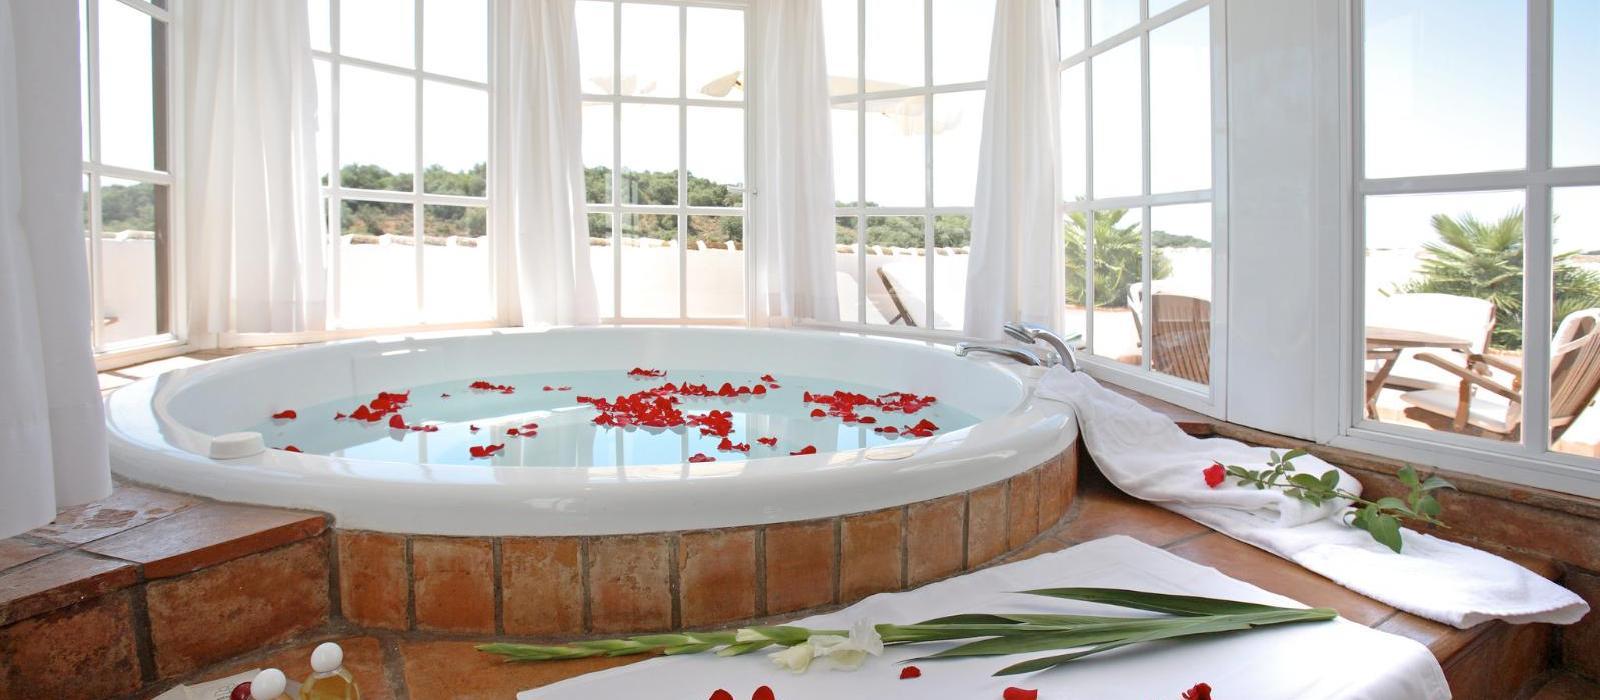 巴瑟罗博巴迪亚怡景酒店(La Bobadilla, A Royal Hideaway Hotel) 图片  www.lhw.cn